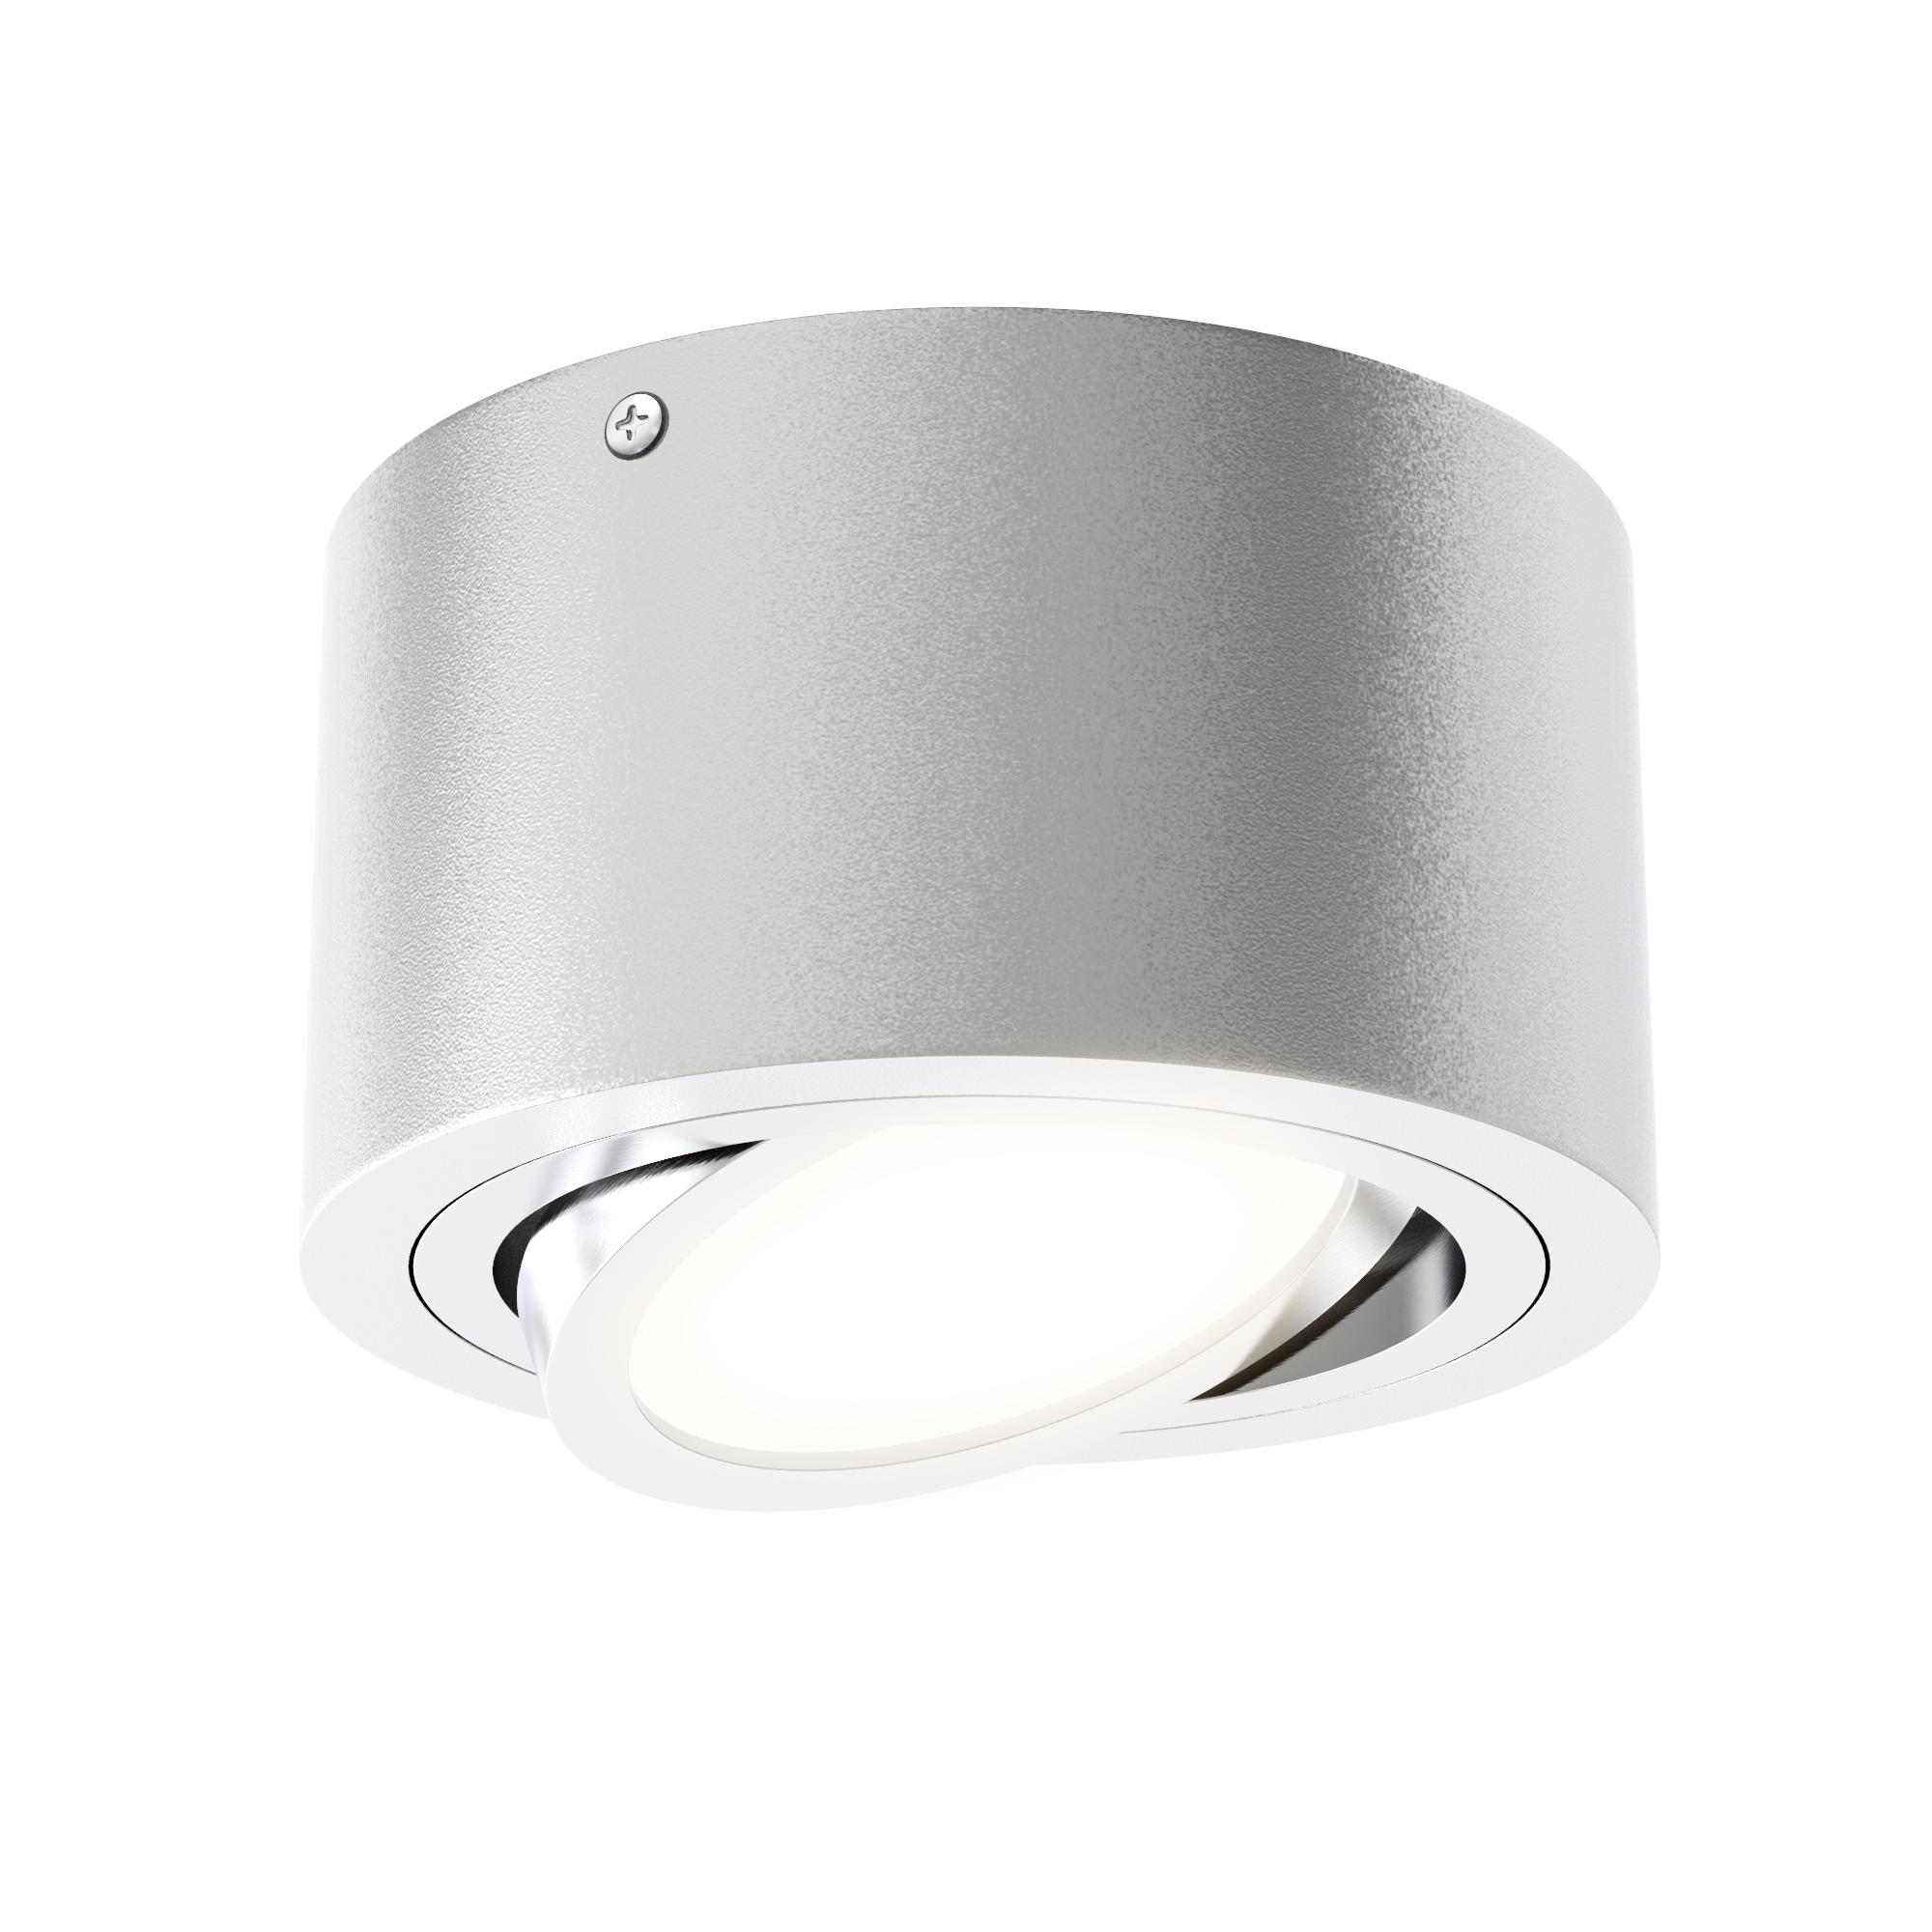 LED Aufbauleuchte, Ø 9 cm, 5 W, Silber